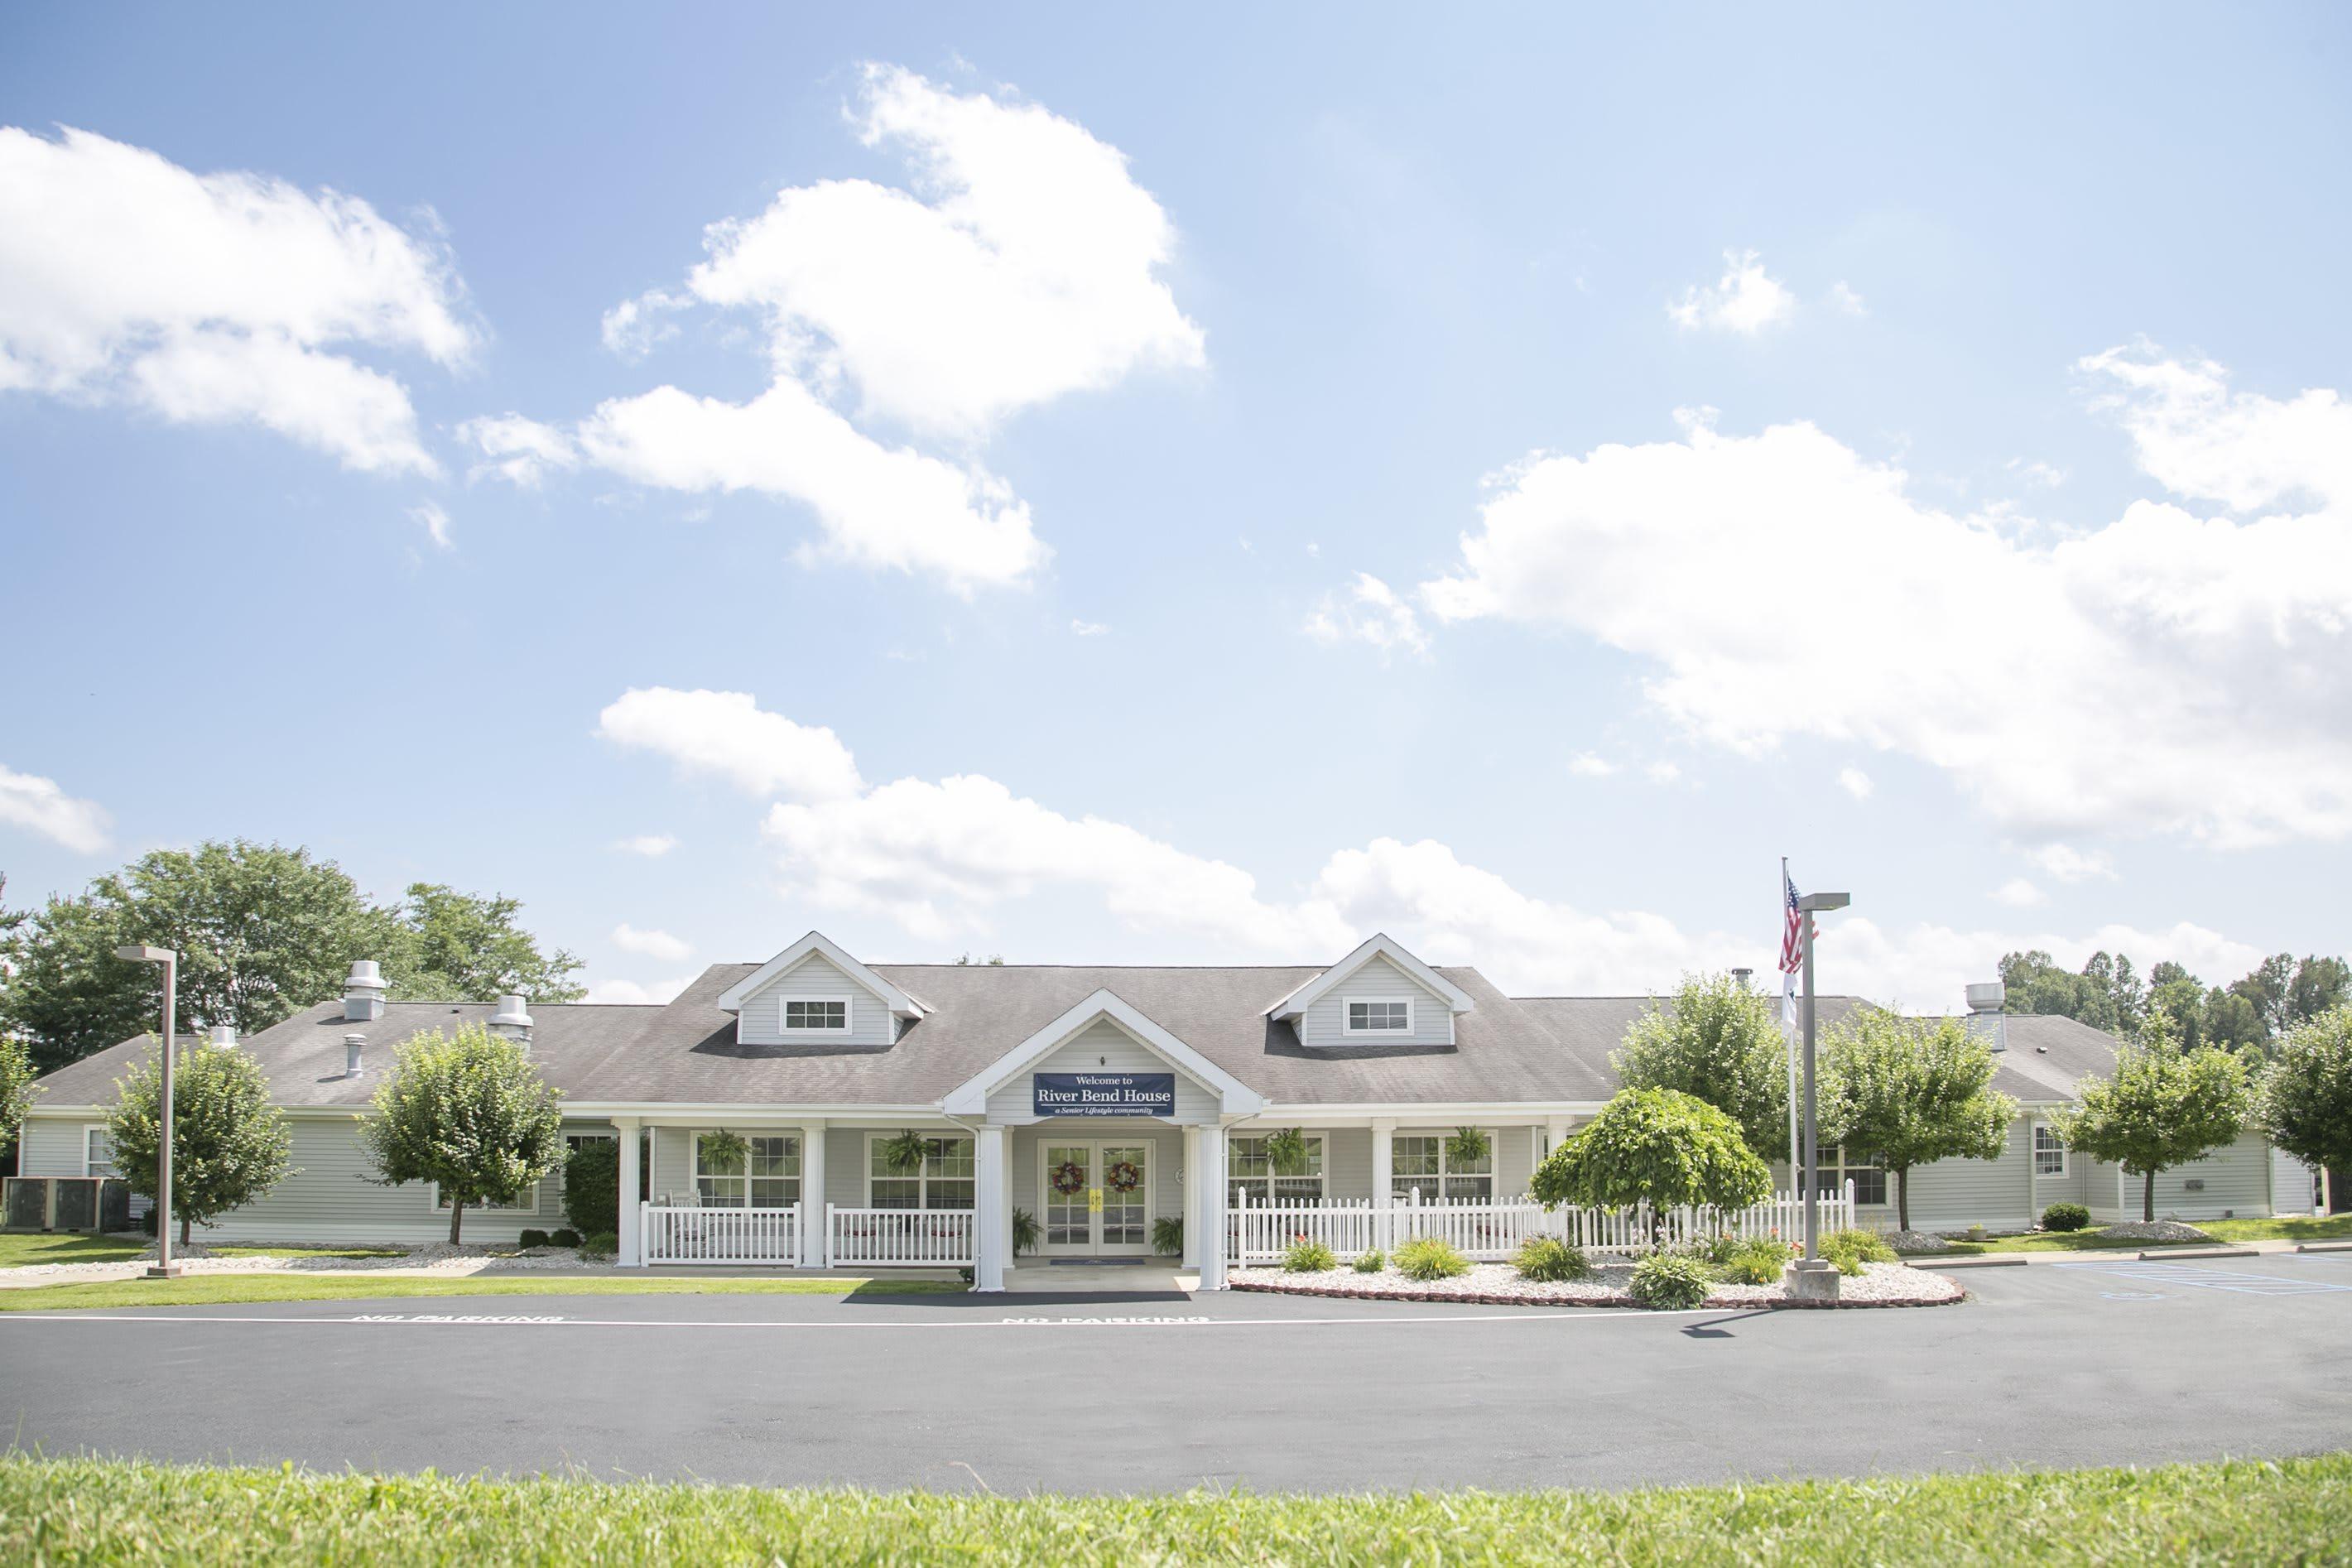 Photo 1 of Randall Residence of Wheelersburg